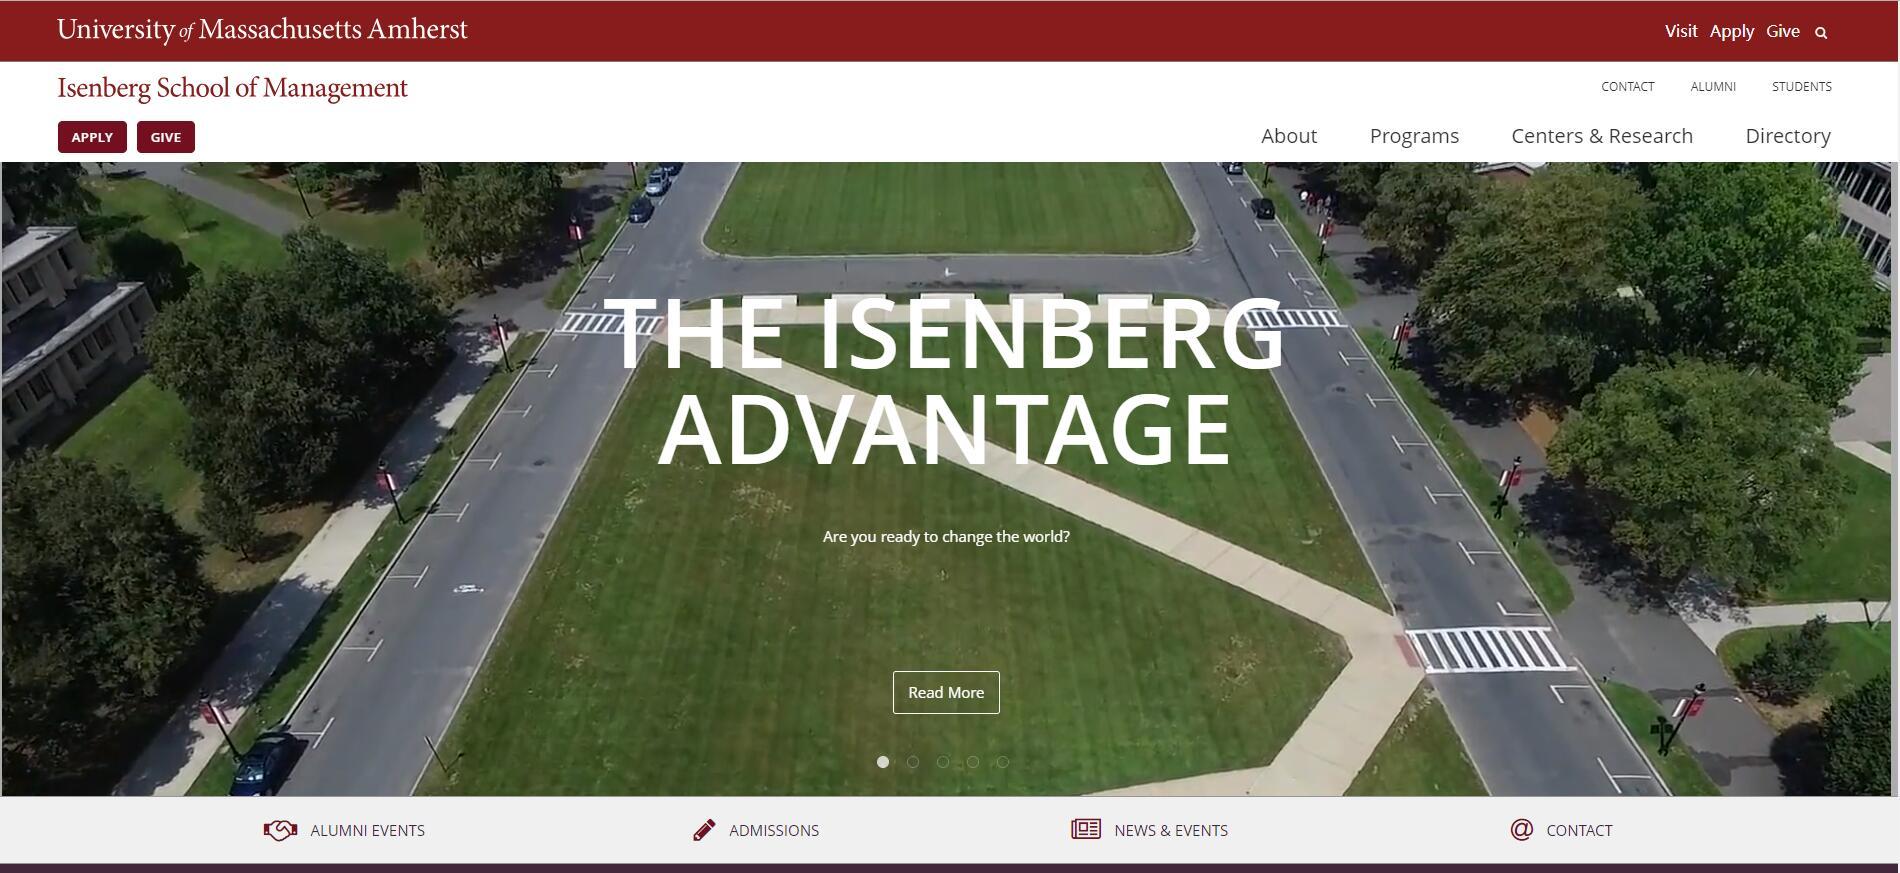 The Isenberg School of Management at University of Massachusetts–Amherst